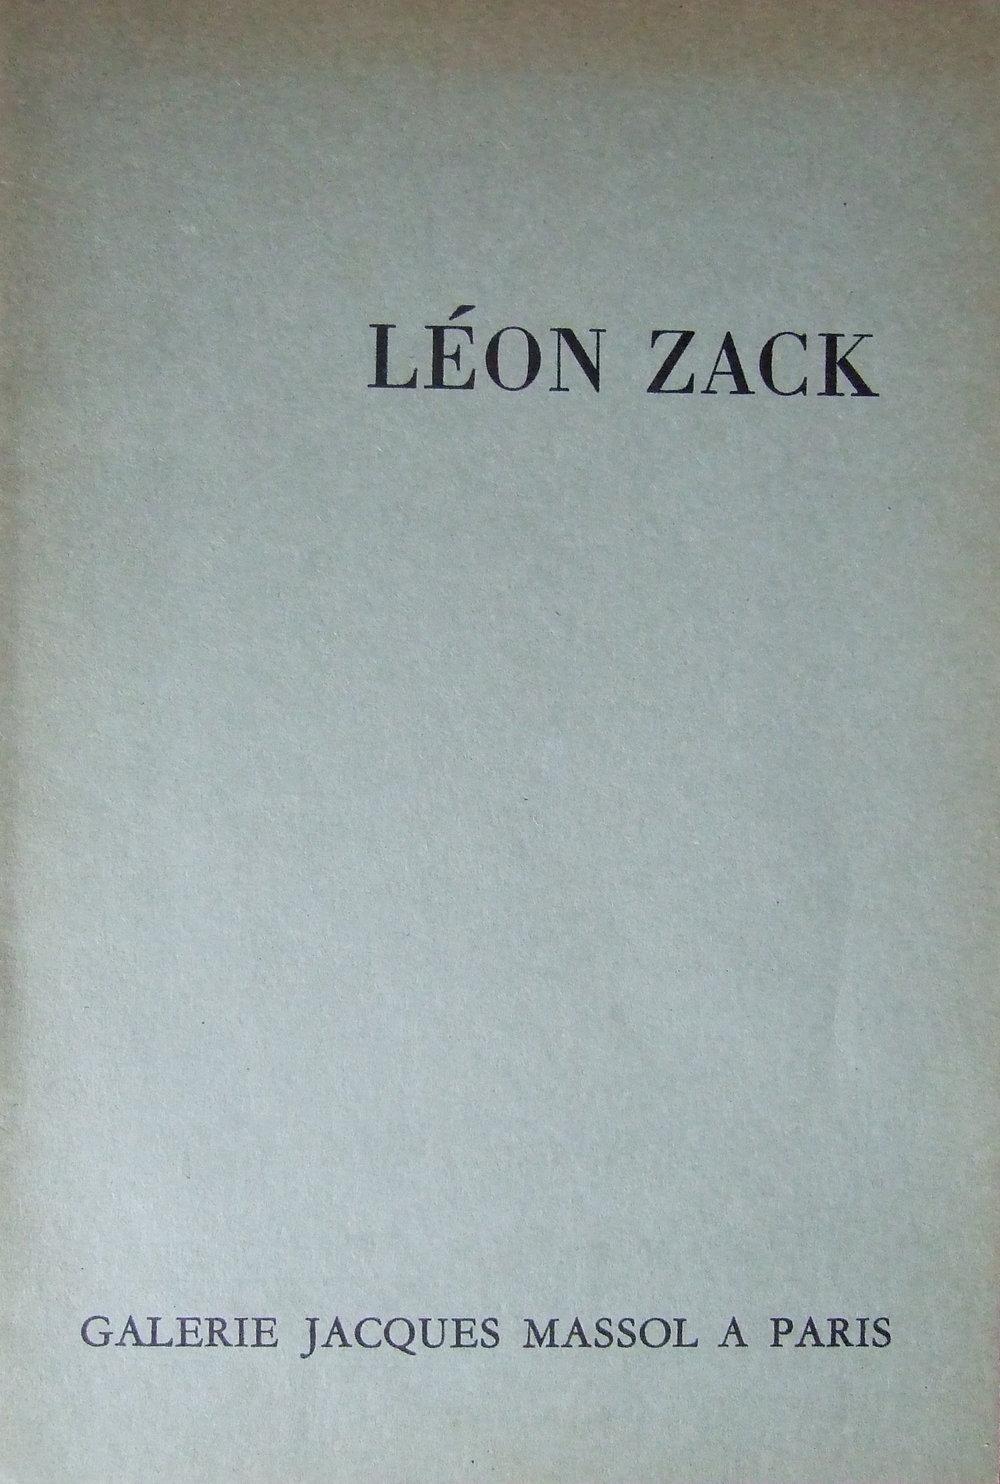 Leon Zack